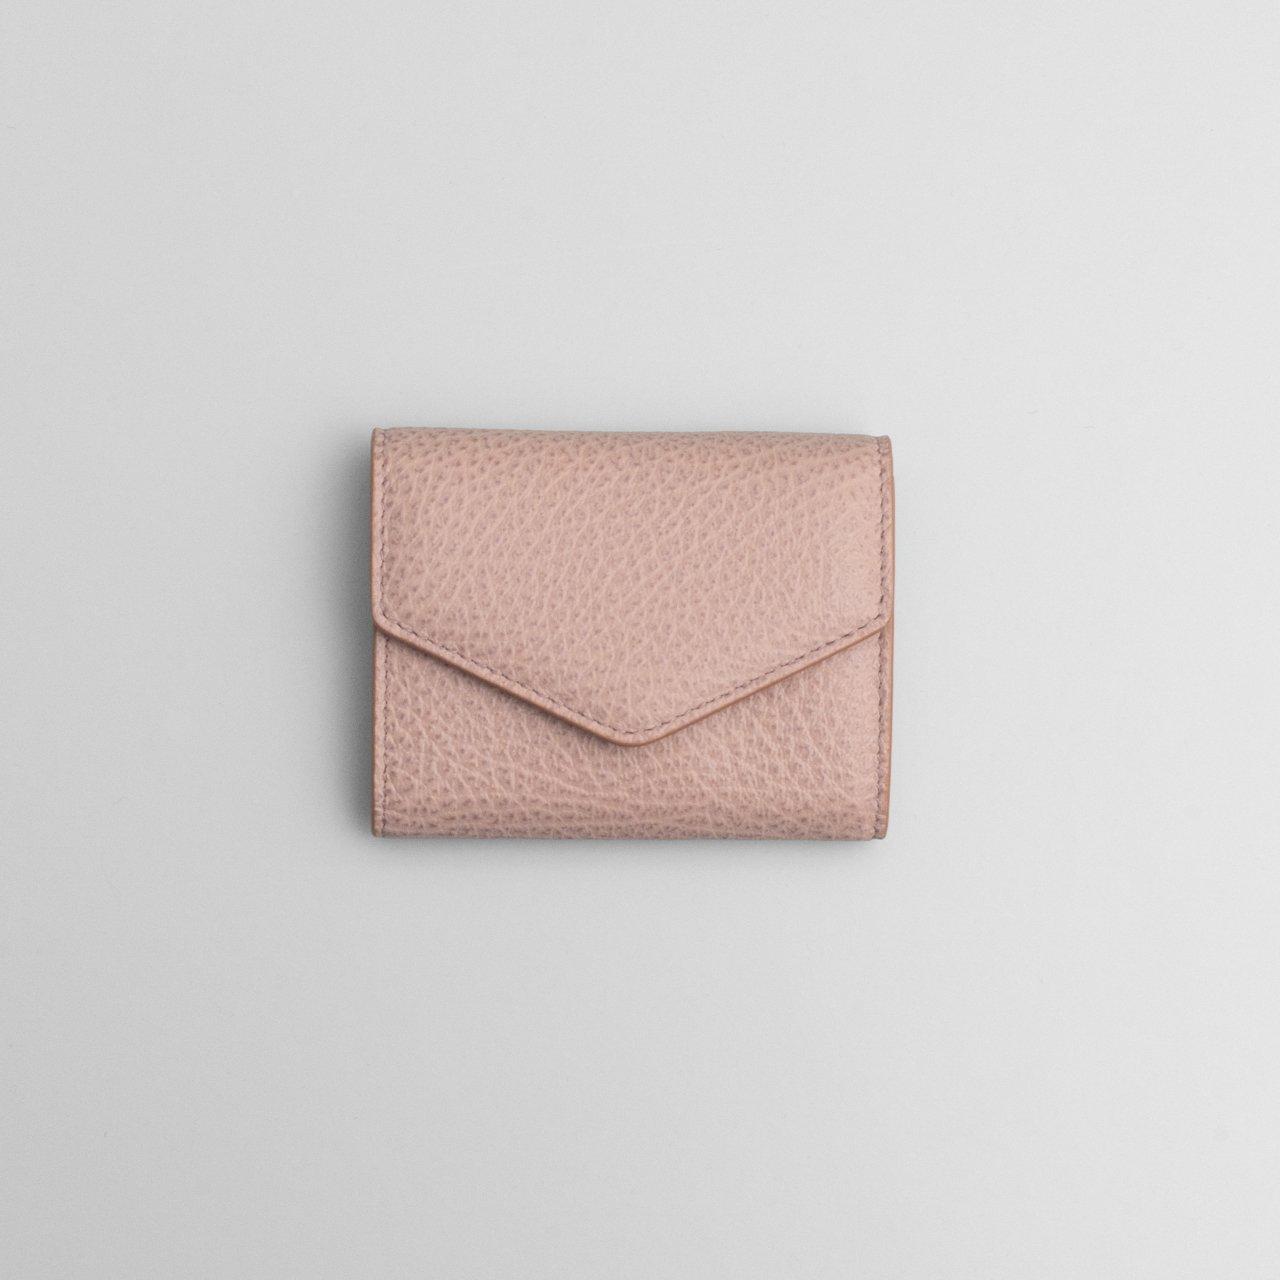 Maison Margiela PARIS <BR>アコーディオン レザー ウォレット<BR>ピンク